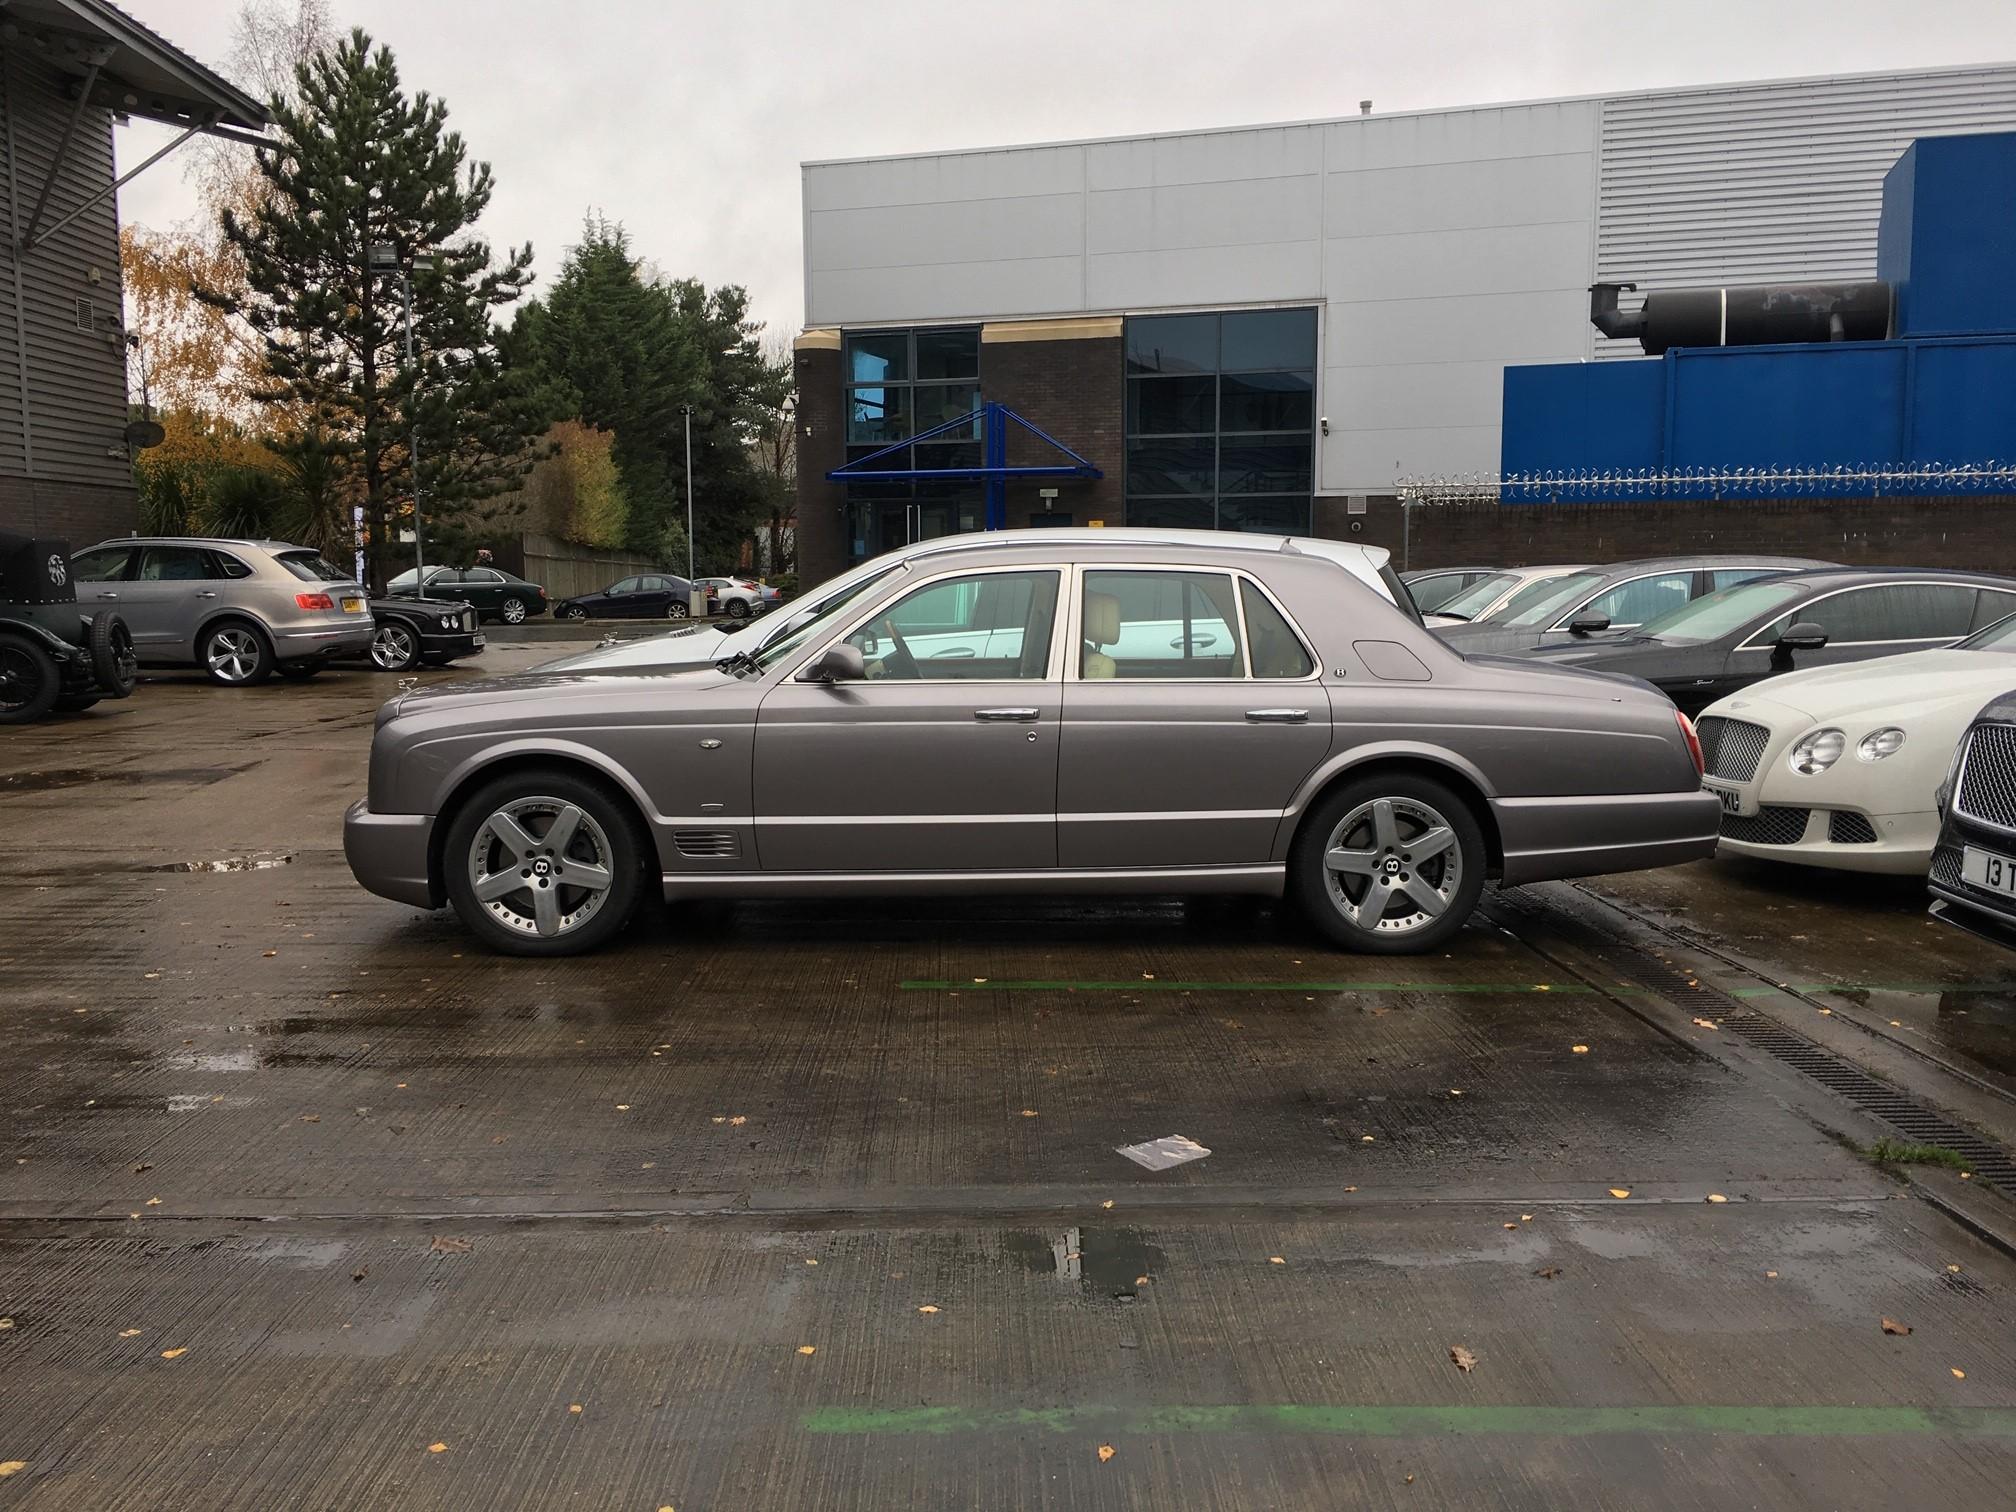 BentleySurrey